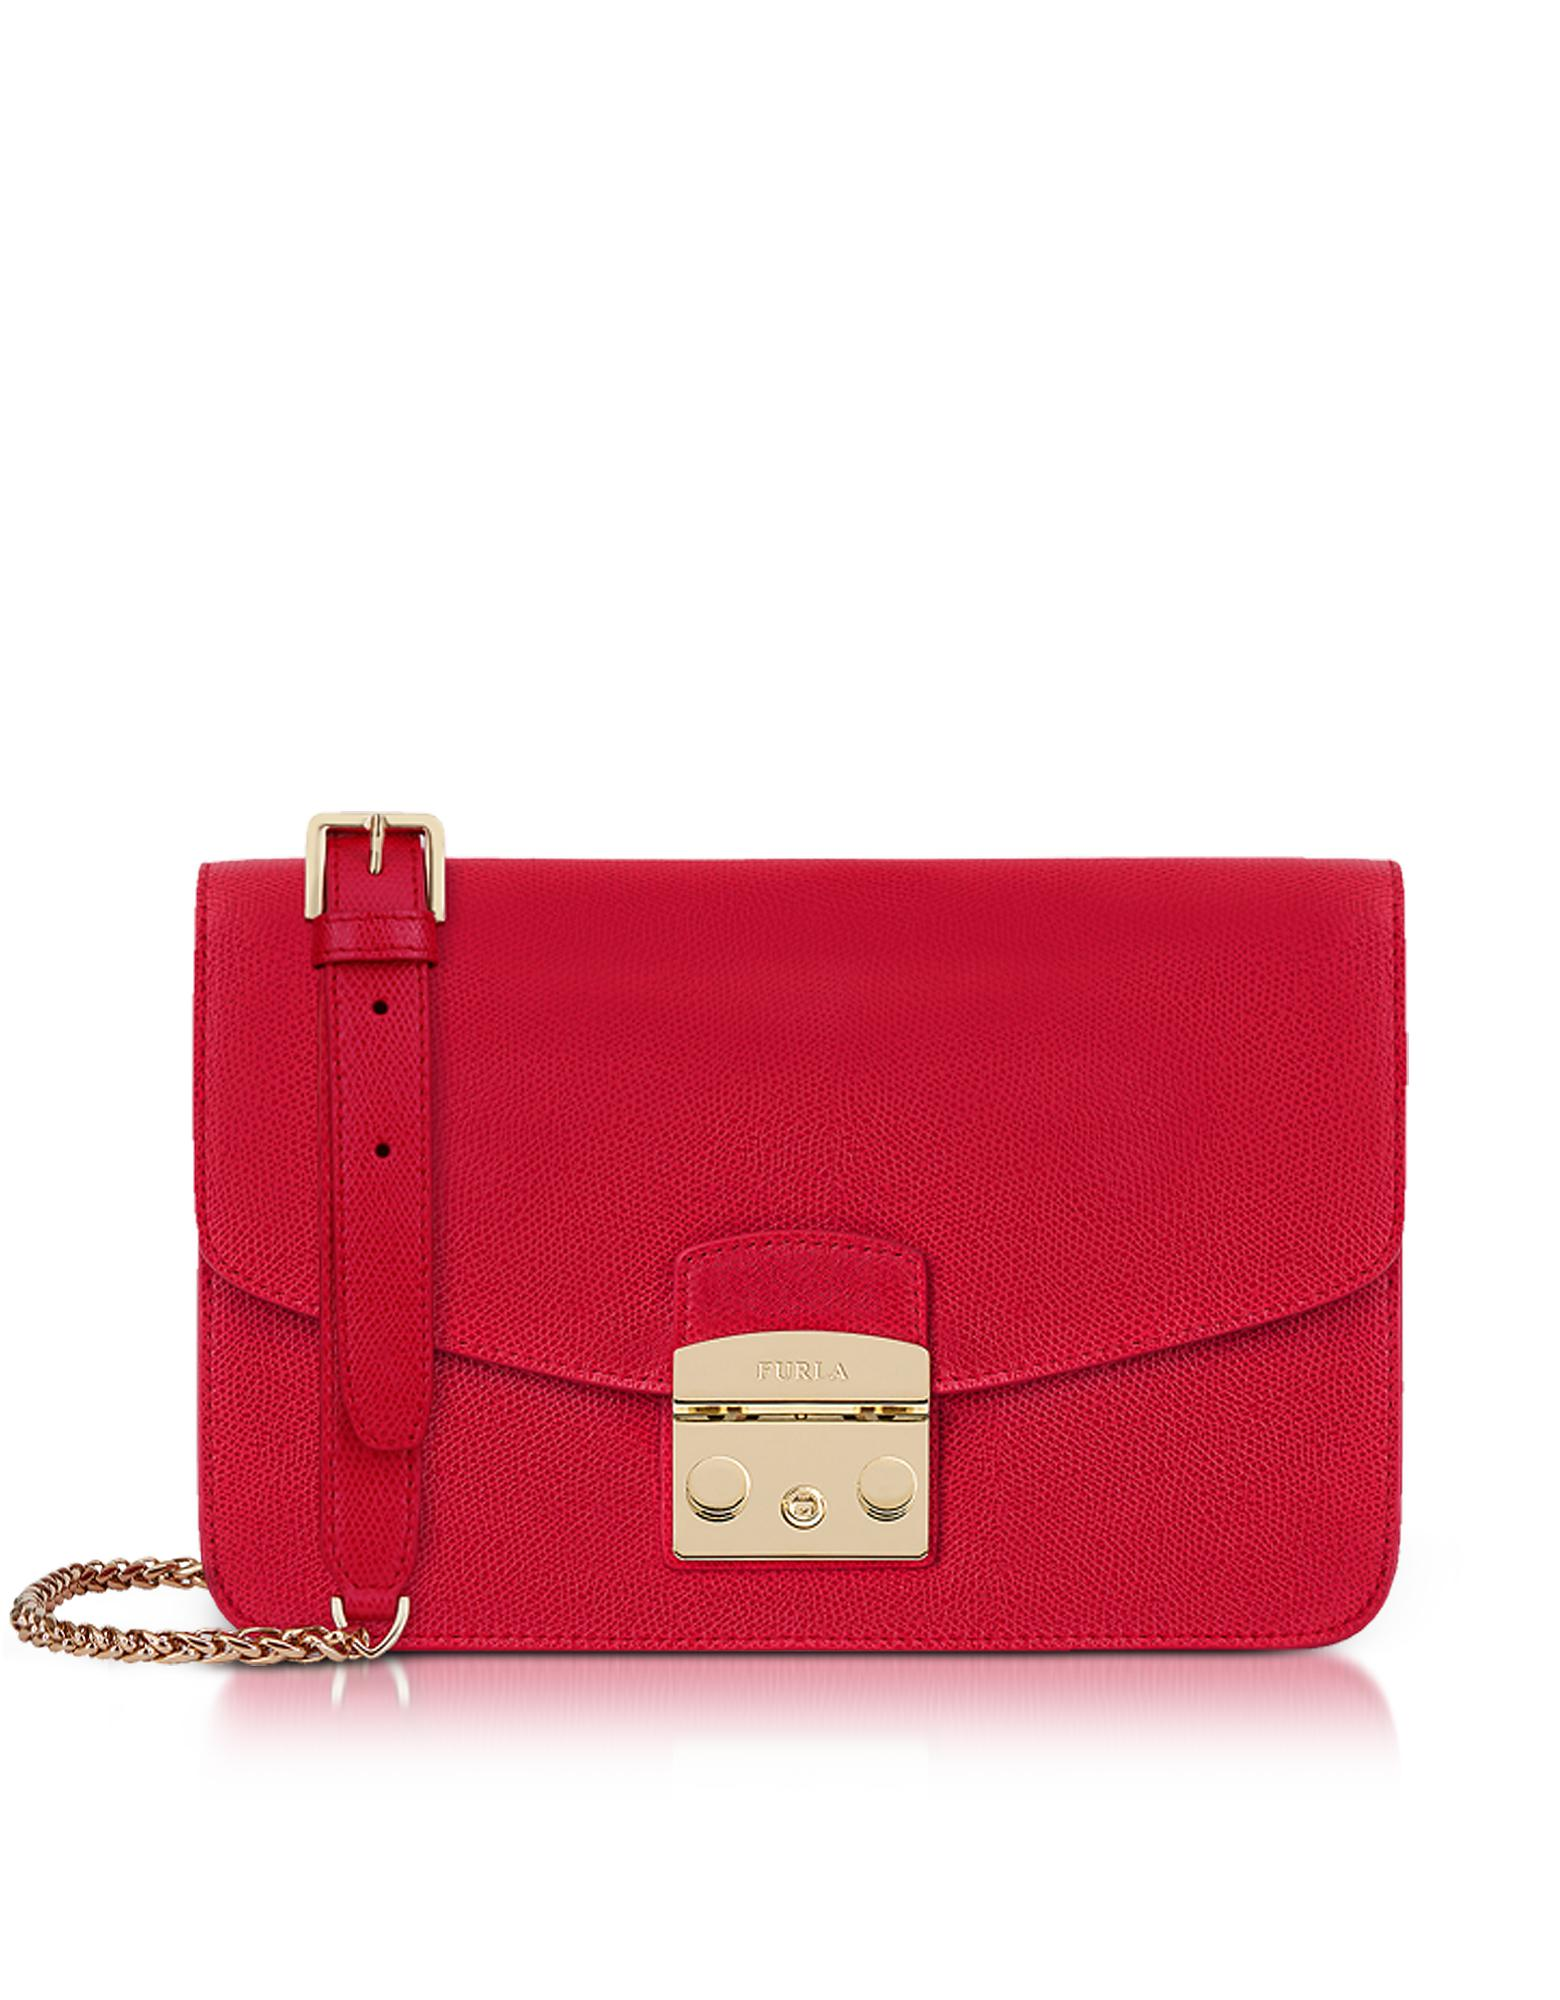 69634d4f518 Furla Ruby Red Lizard Printed Leather Metropolis Small Shoulder Bag ...